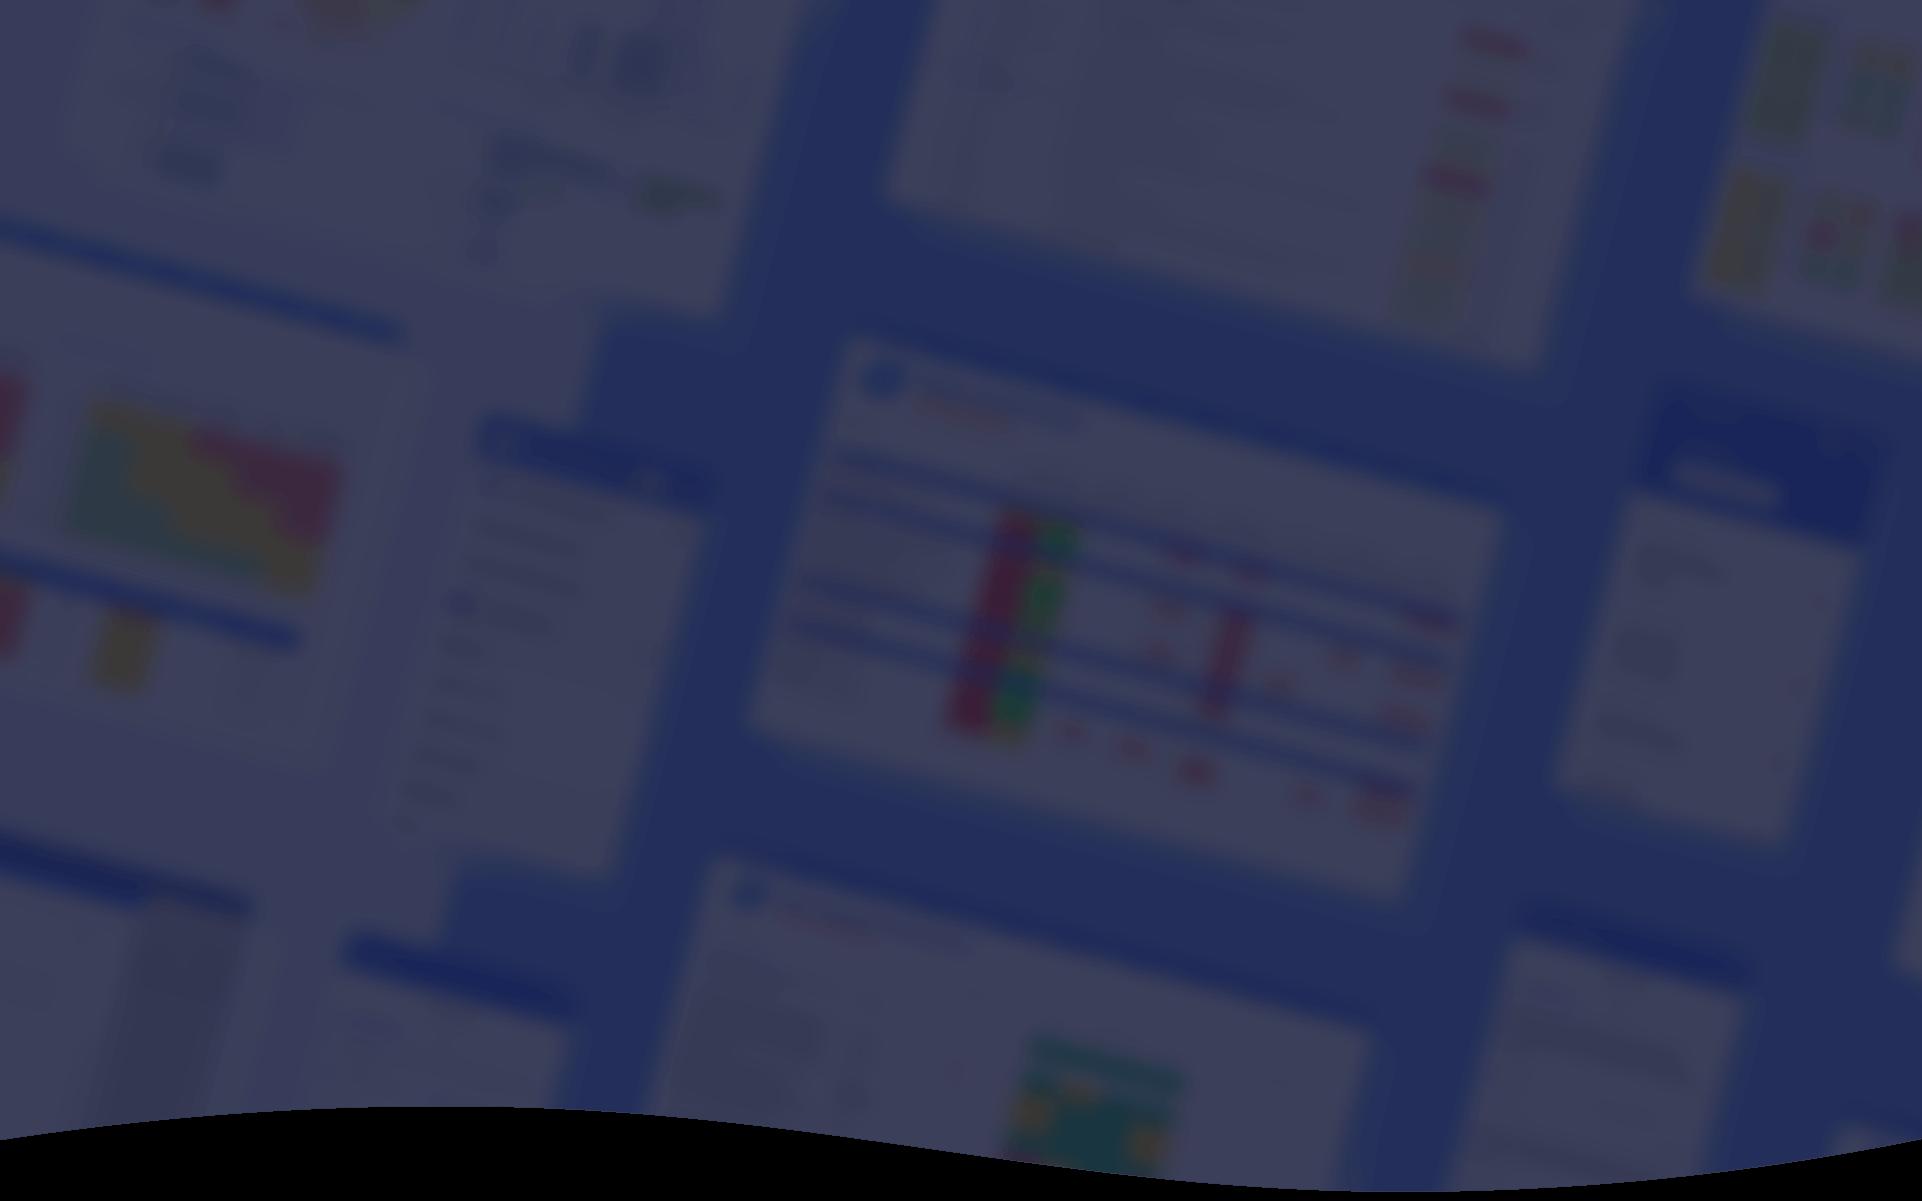 Protecht-ERM-screens-hero-background